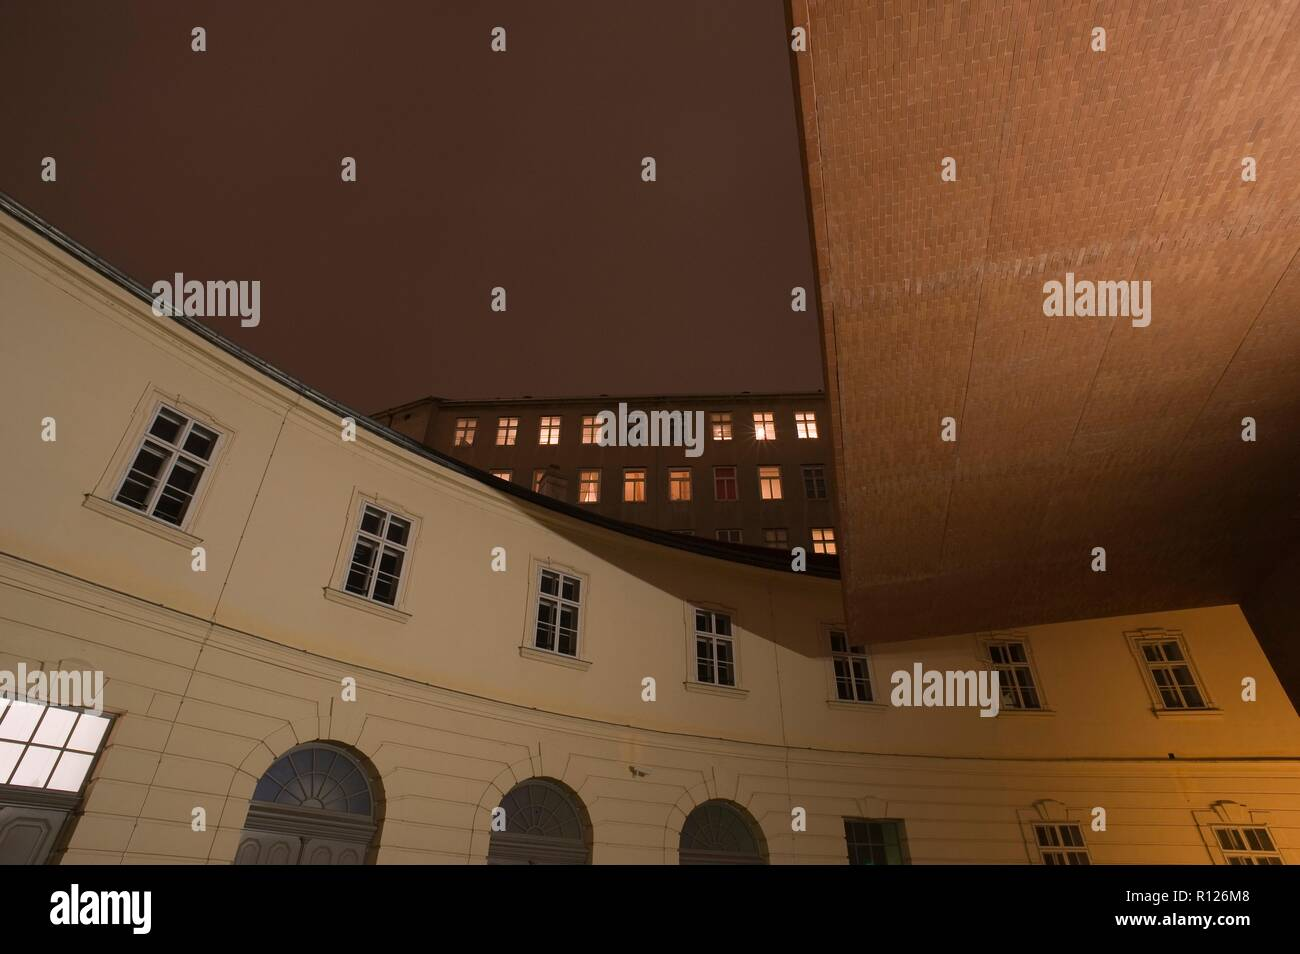 Wien, Museumsquartier, Architekturdetail - Vienna, Museumsquartier, Detail Stock Photo